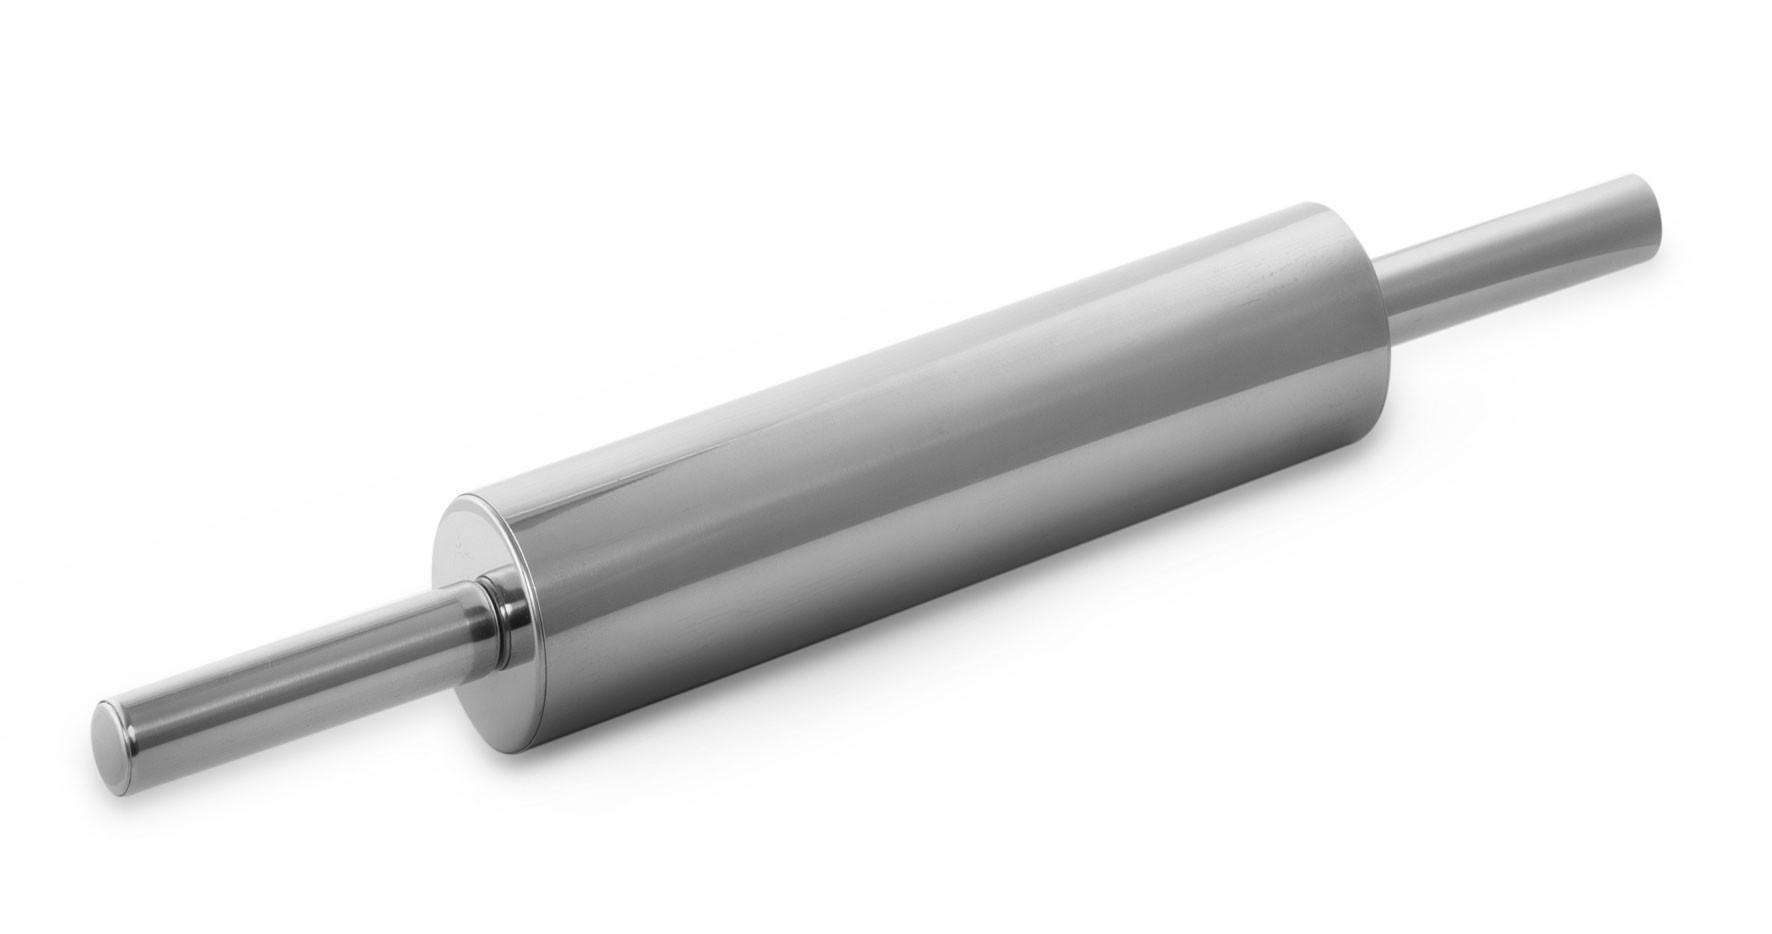 Rolo de Massa Inox - 44 x 5 cm - Mimo Style  - Lojão de Ofertas